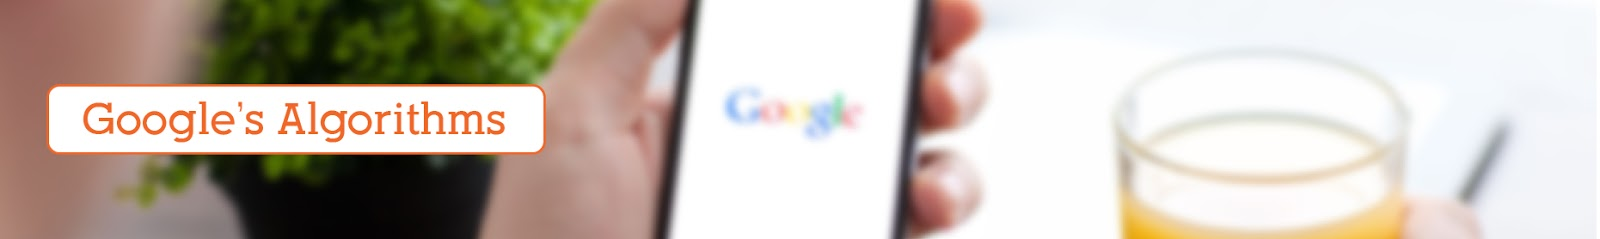 Google s Algorithms